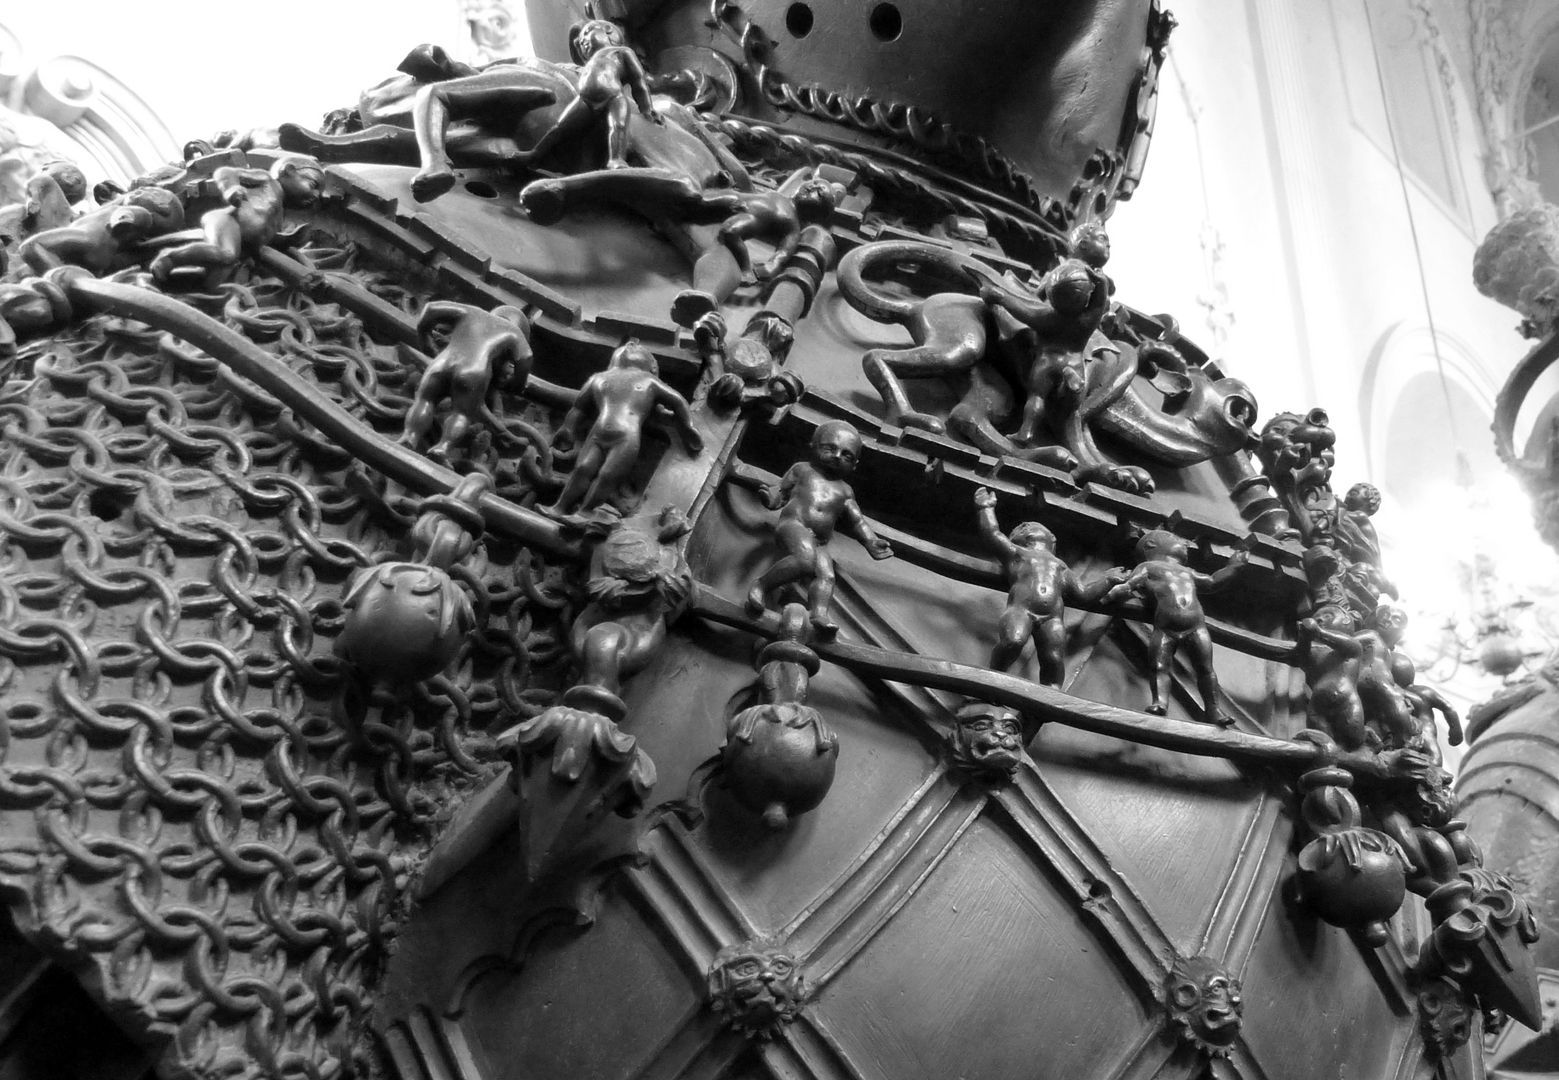 Ferdinand of Portugal (Innsbruck) Kette mit Amoretten